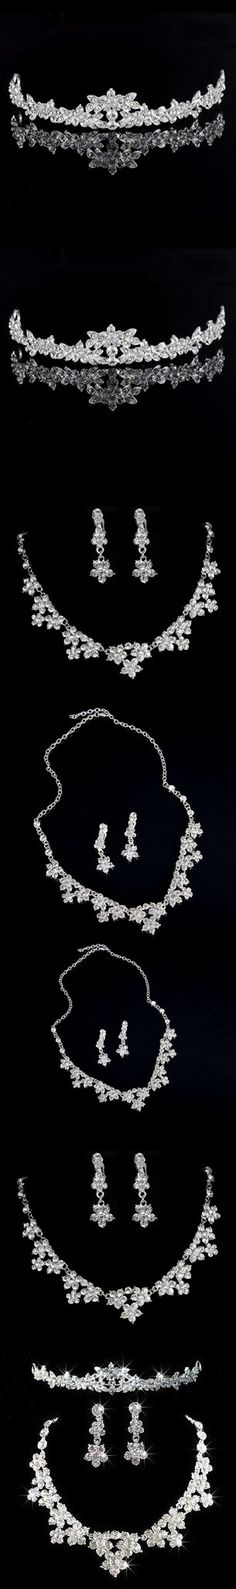 2015 Luxury classic bride 3 -piece sets jewelry Necklace + Earrings + Tiaras 3 pieces Set Wedding accessories Jewelry Set